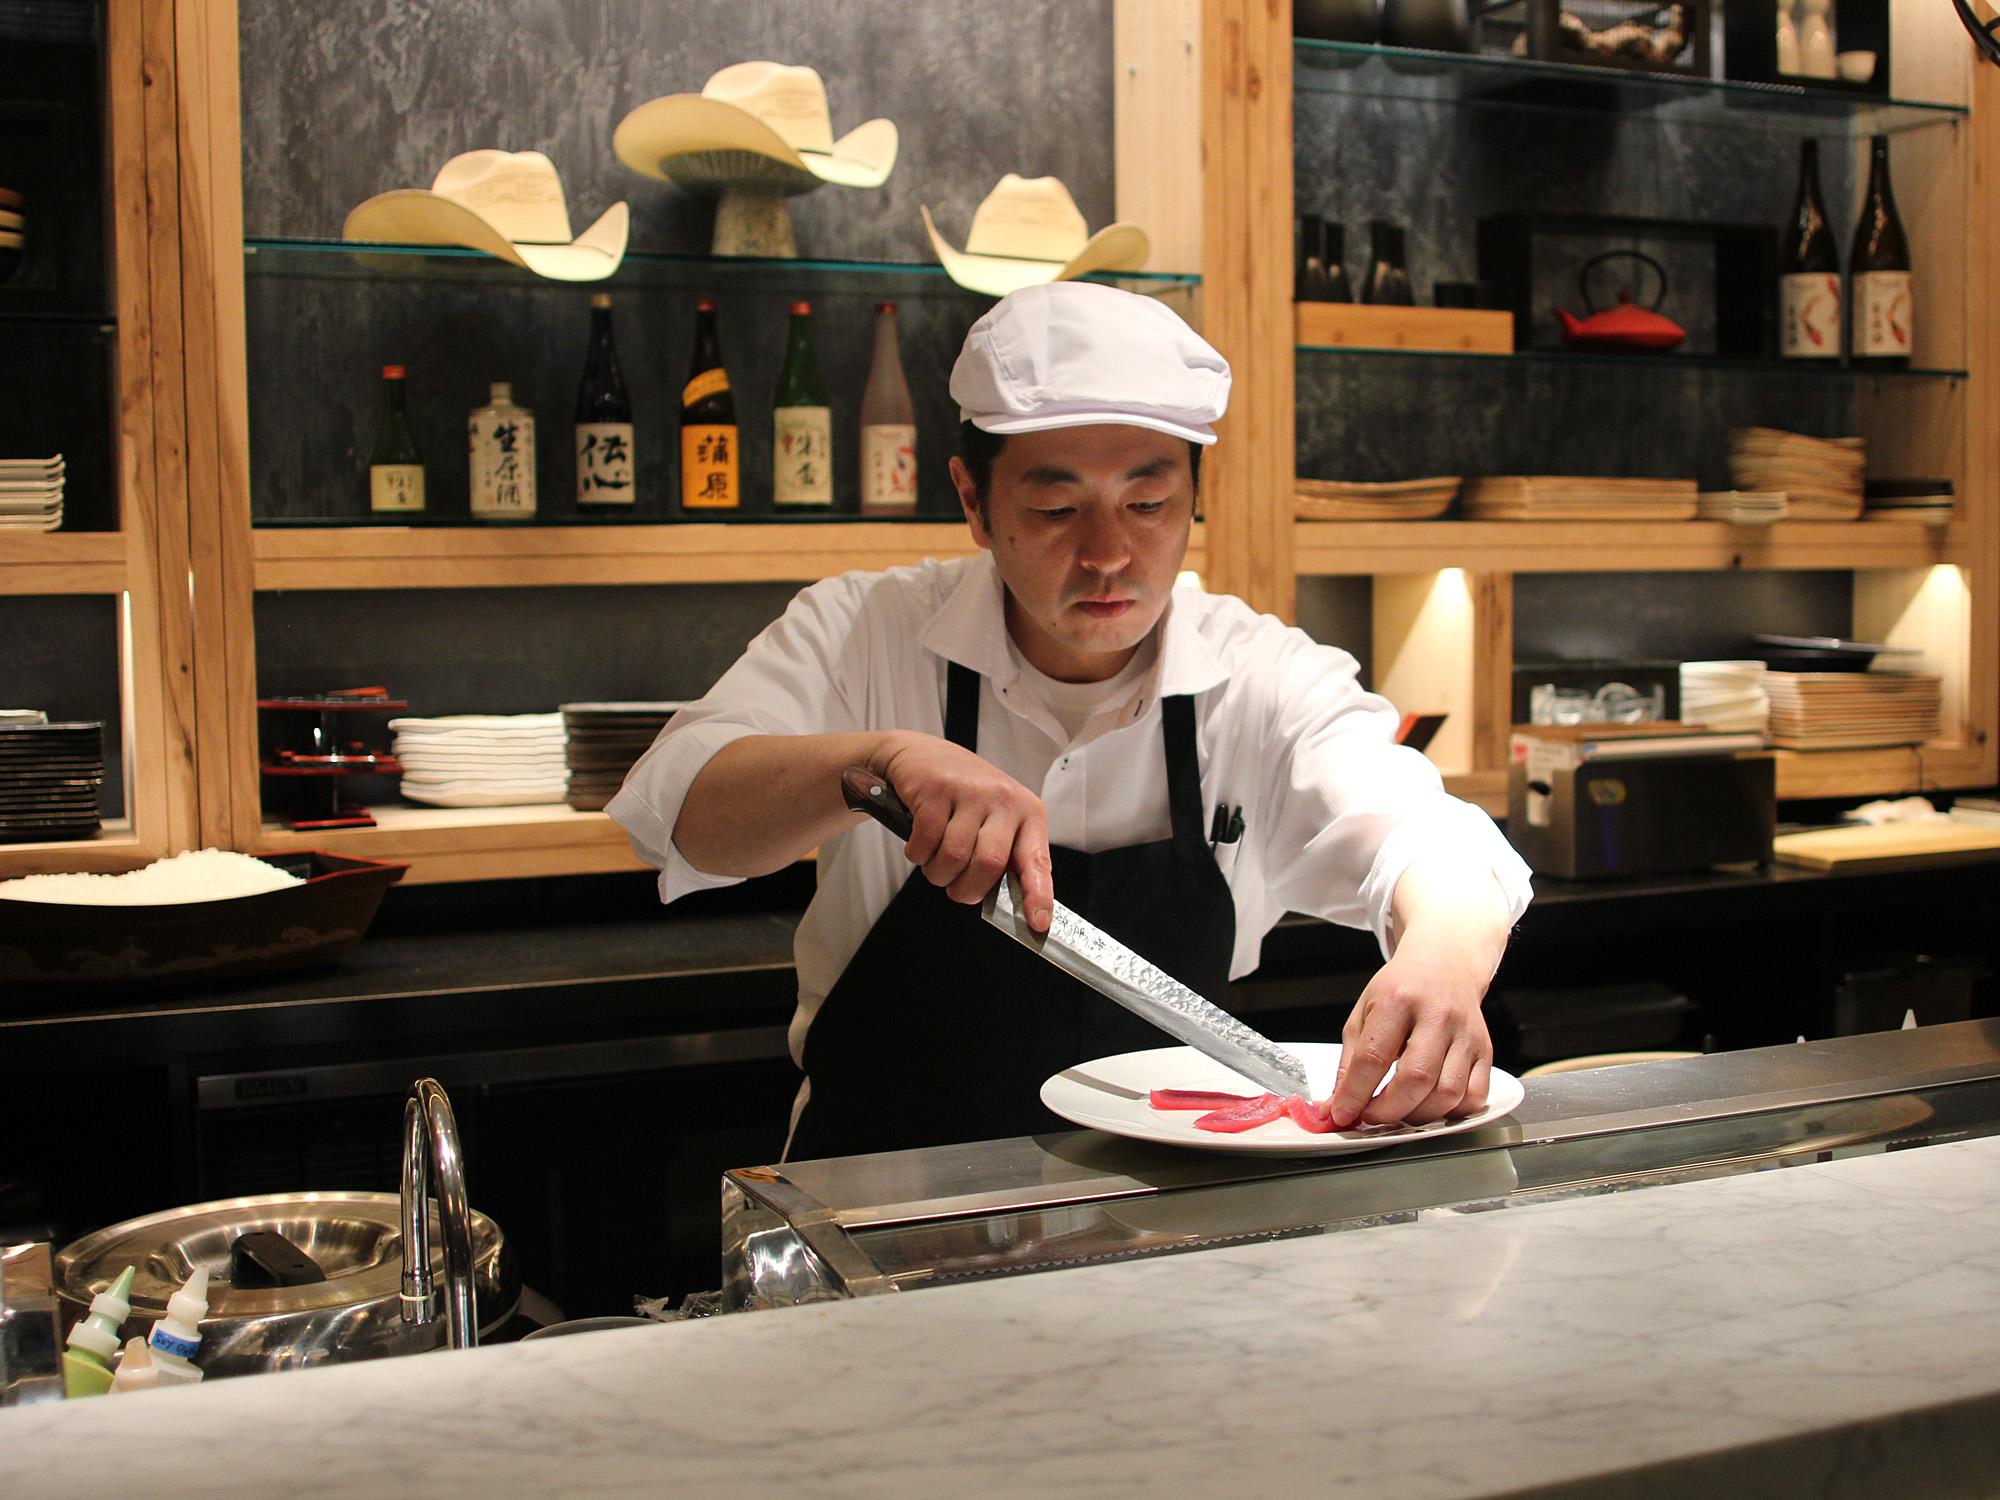 SEE NAOKI NAKASHIMA'S BEAUTIFUL SASHIMI PLATES AT NAOKI SUSHI